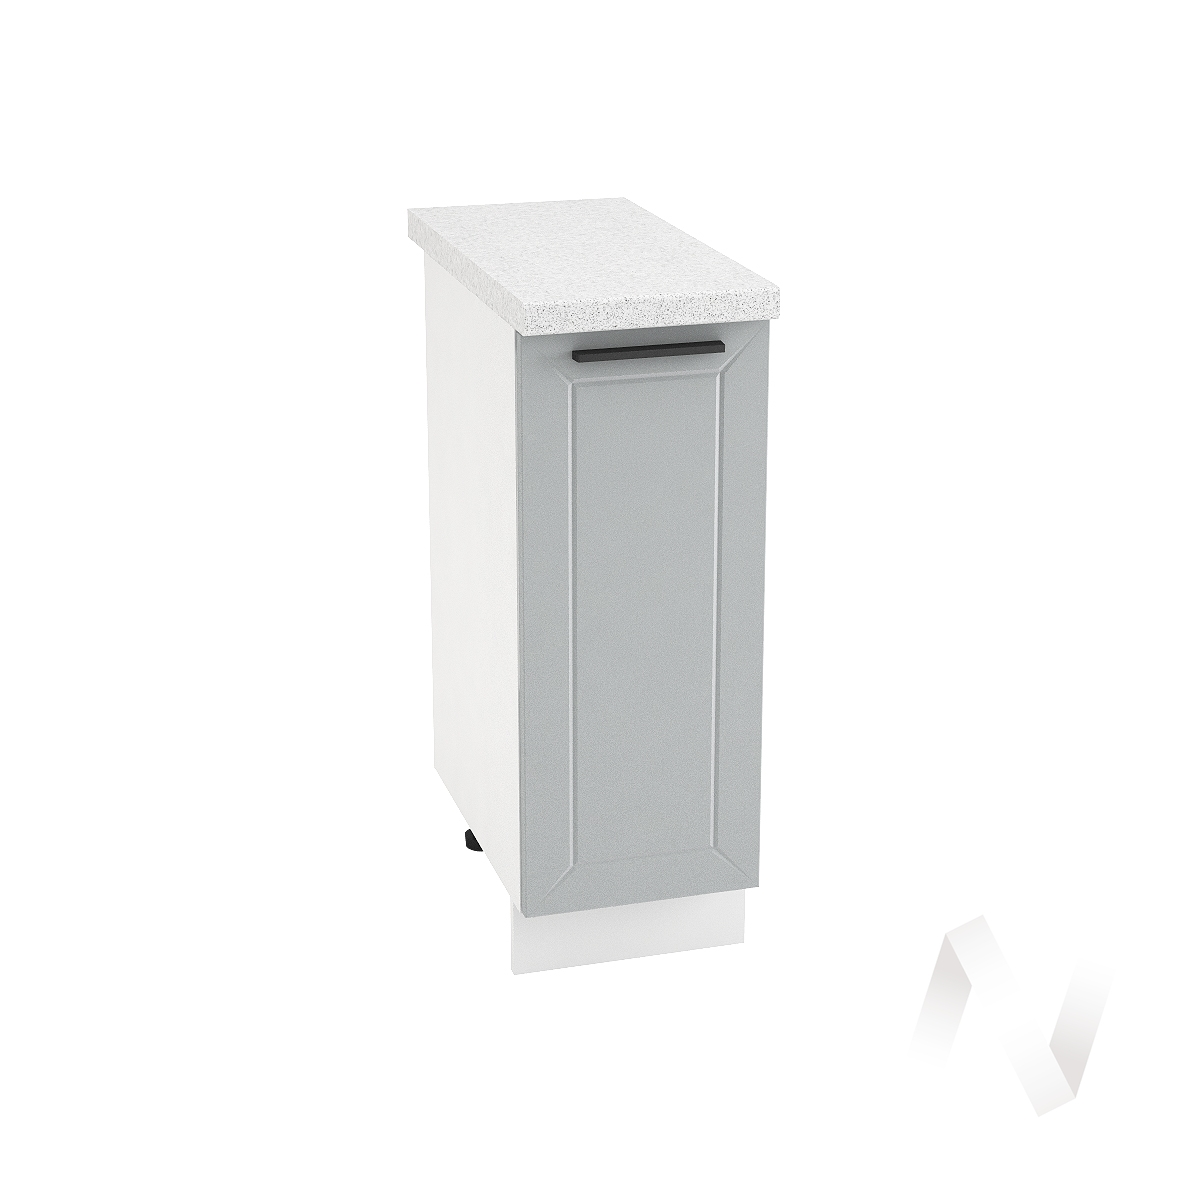 "Кухня ""Глетчер"": Шкаф нижний 300, ШН 300 (Гейнсборо силк/корпус белый)"